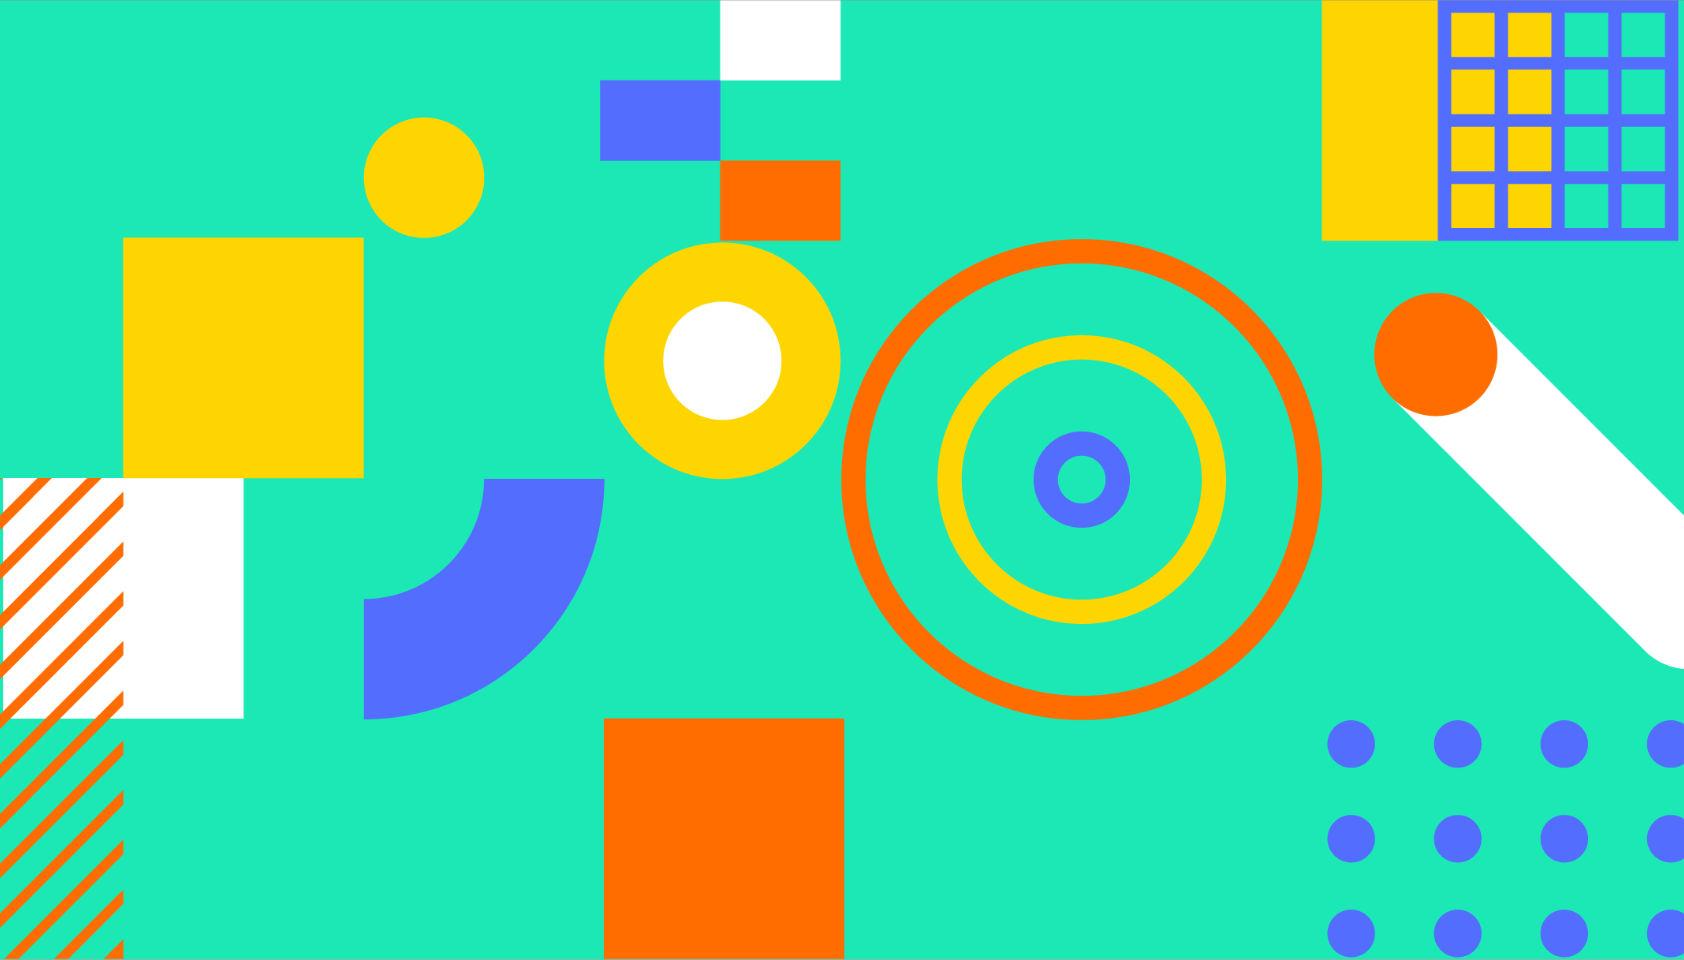 Popular design news of the week: May 7, 2018 - May 13, 2018